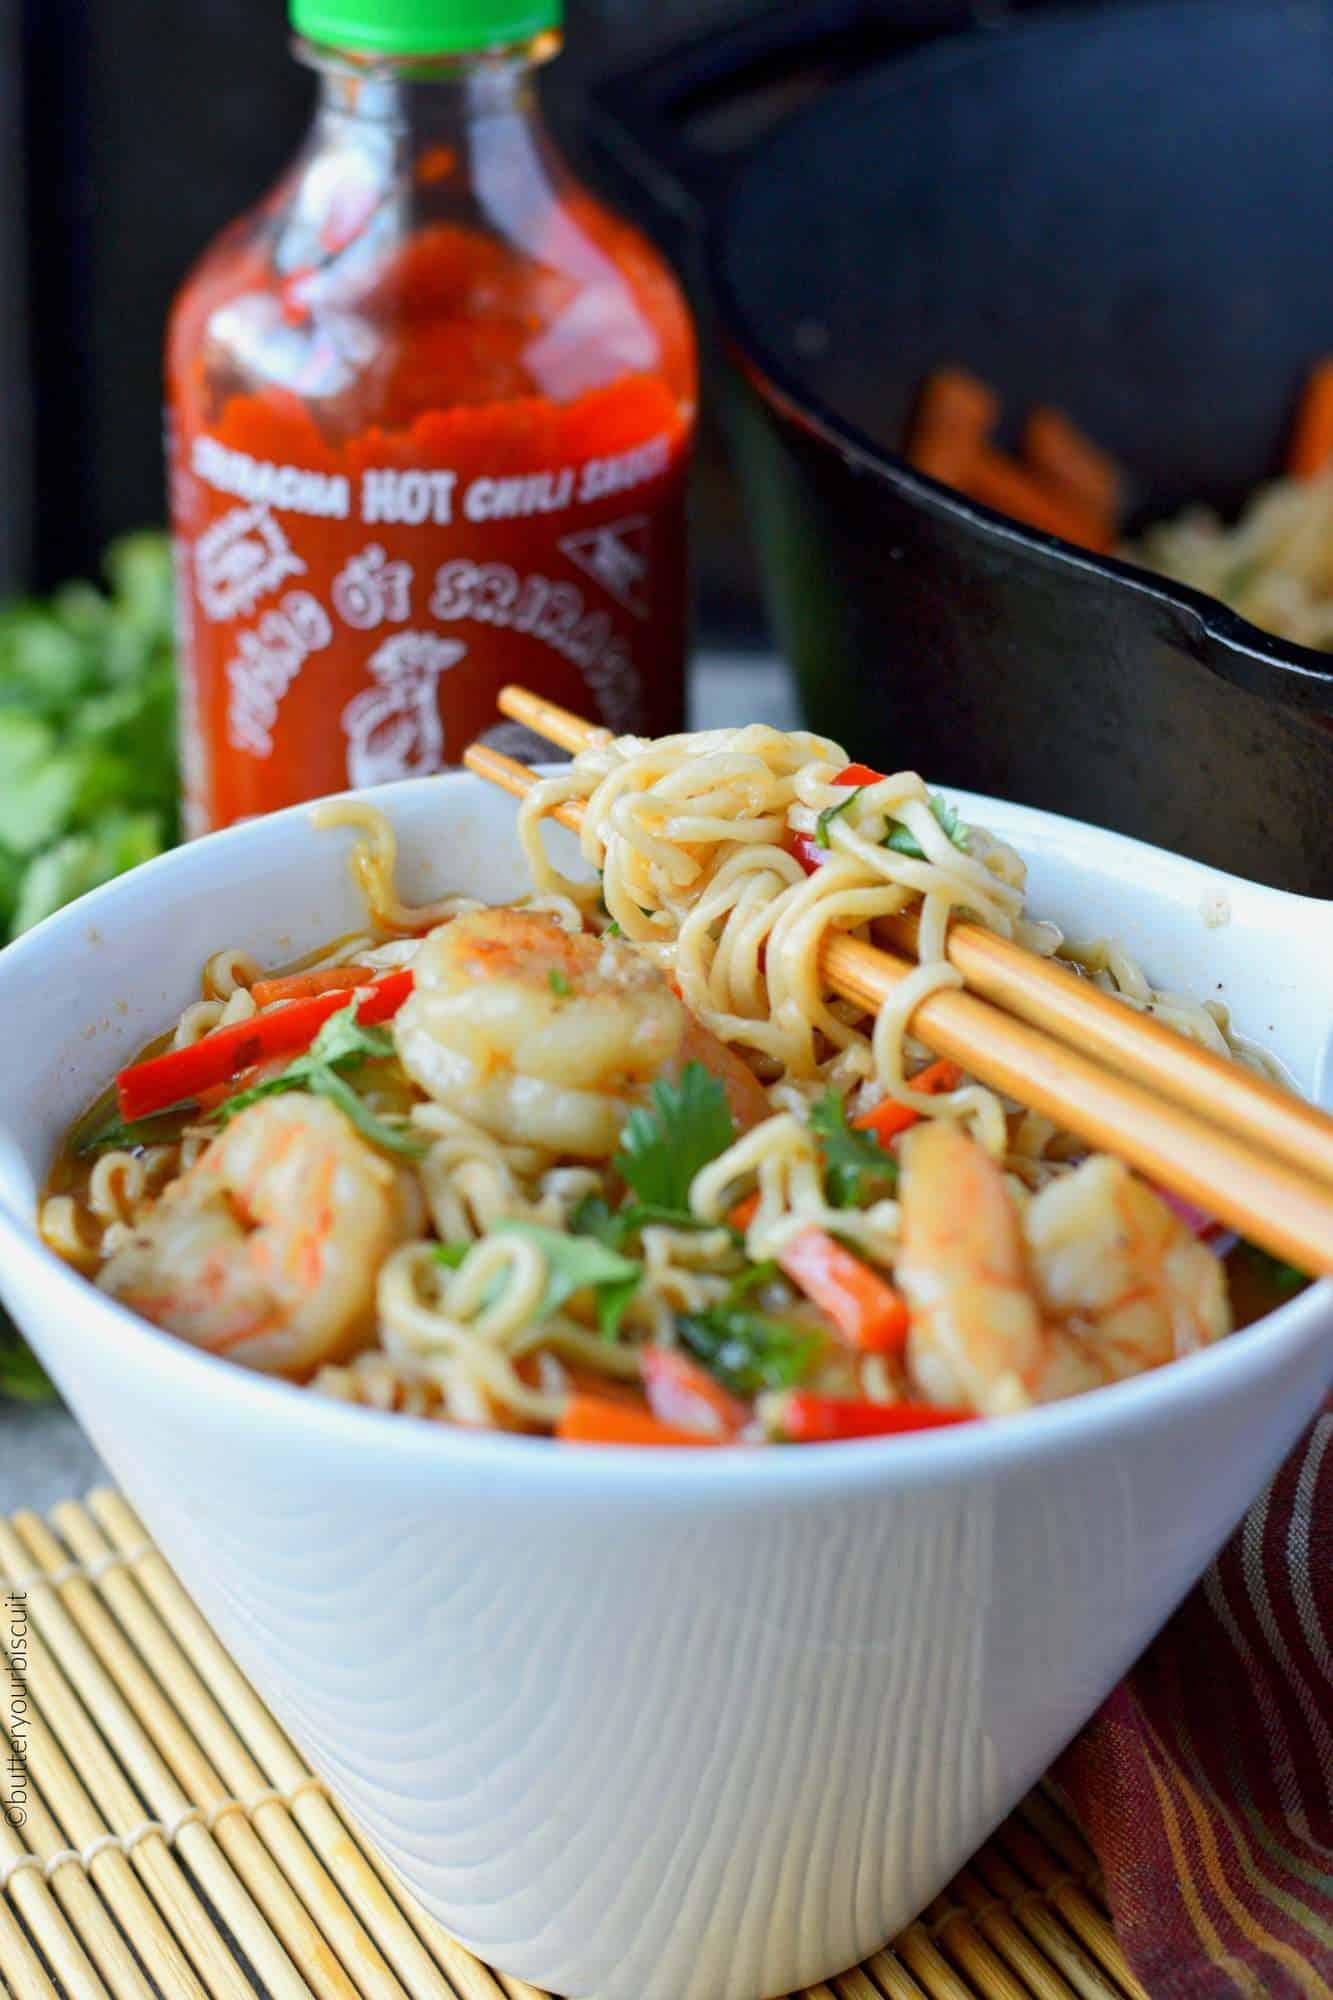 Spicy shrimp ramen bowl with sriracha bottle